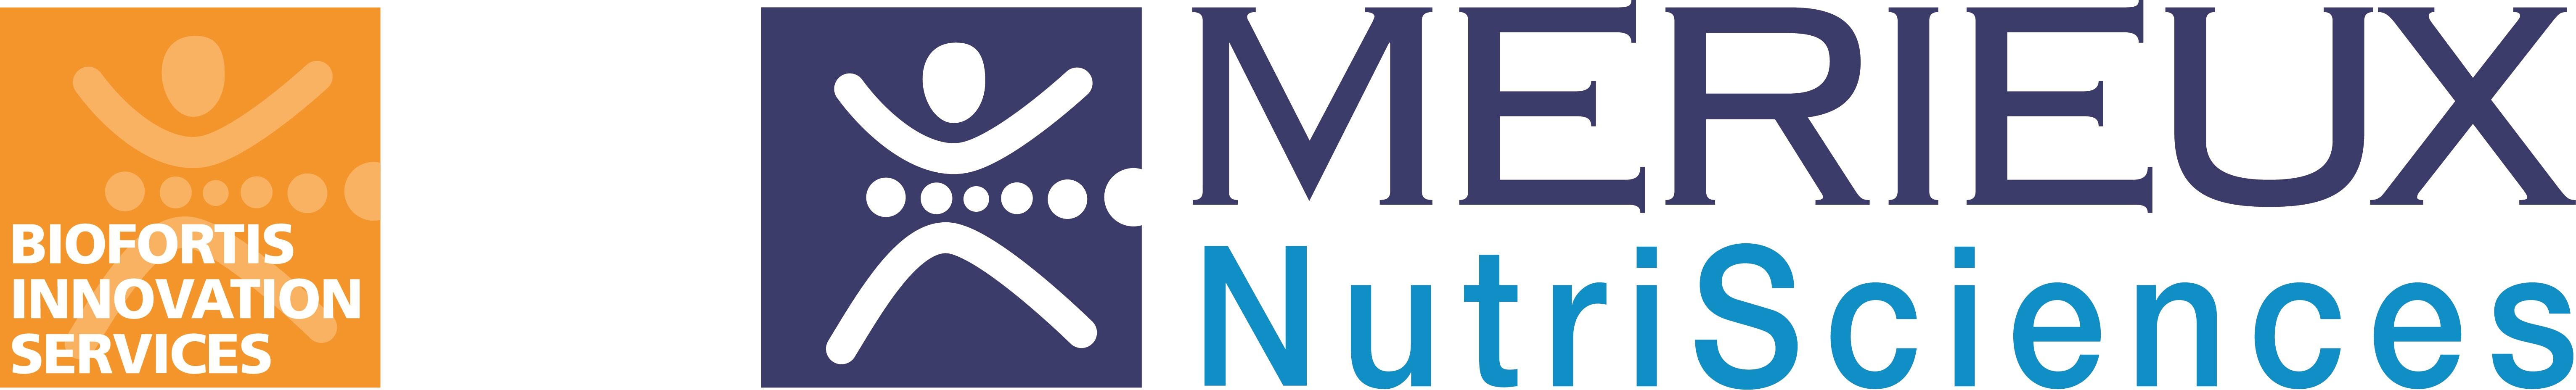 BIOFORTIS MERIEUX NUTRISCIENCES